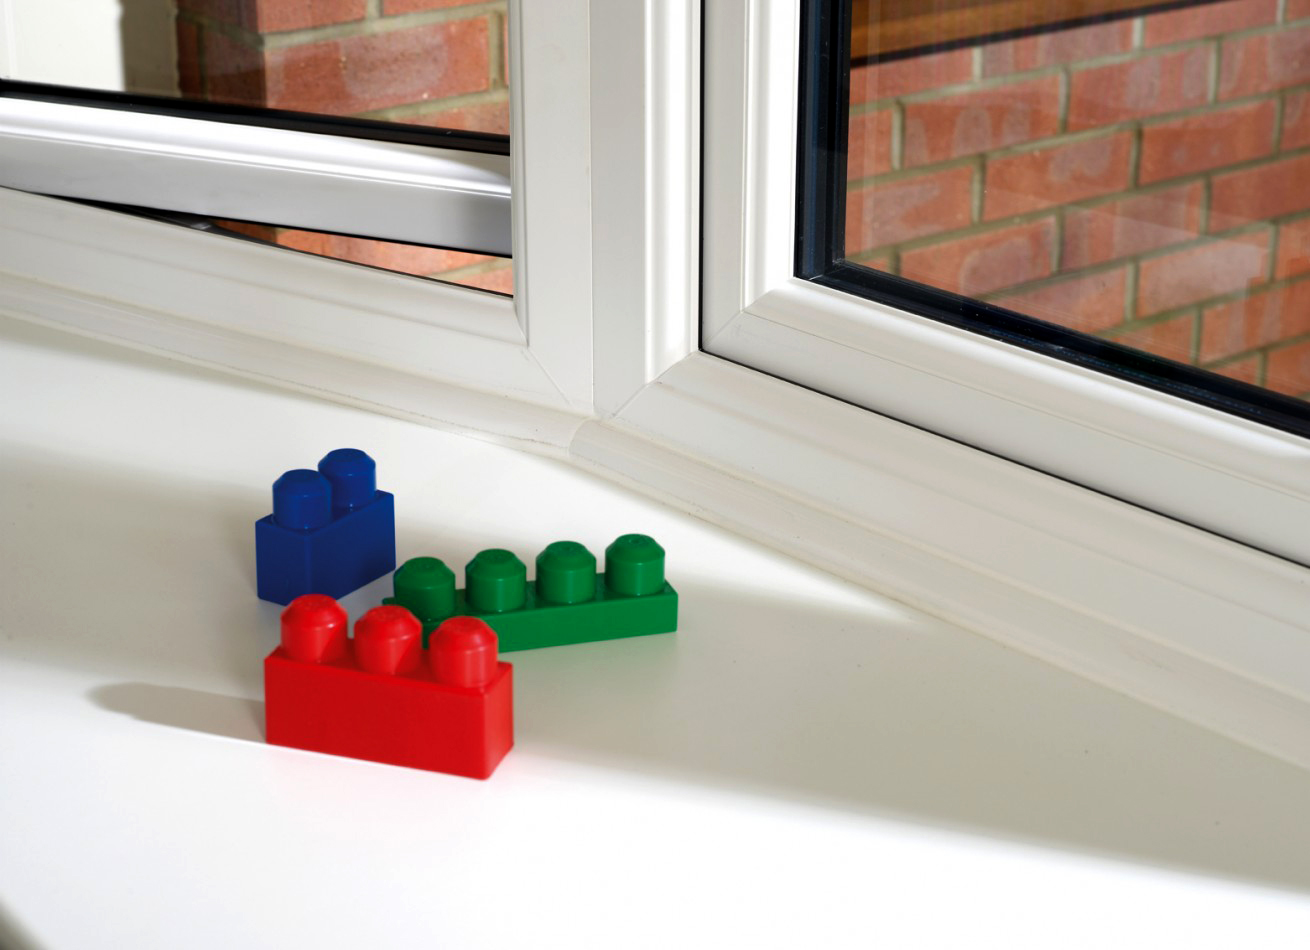 casement windows Glazing trade Supplies